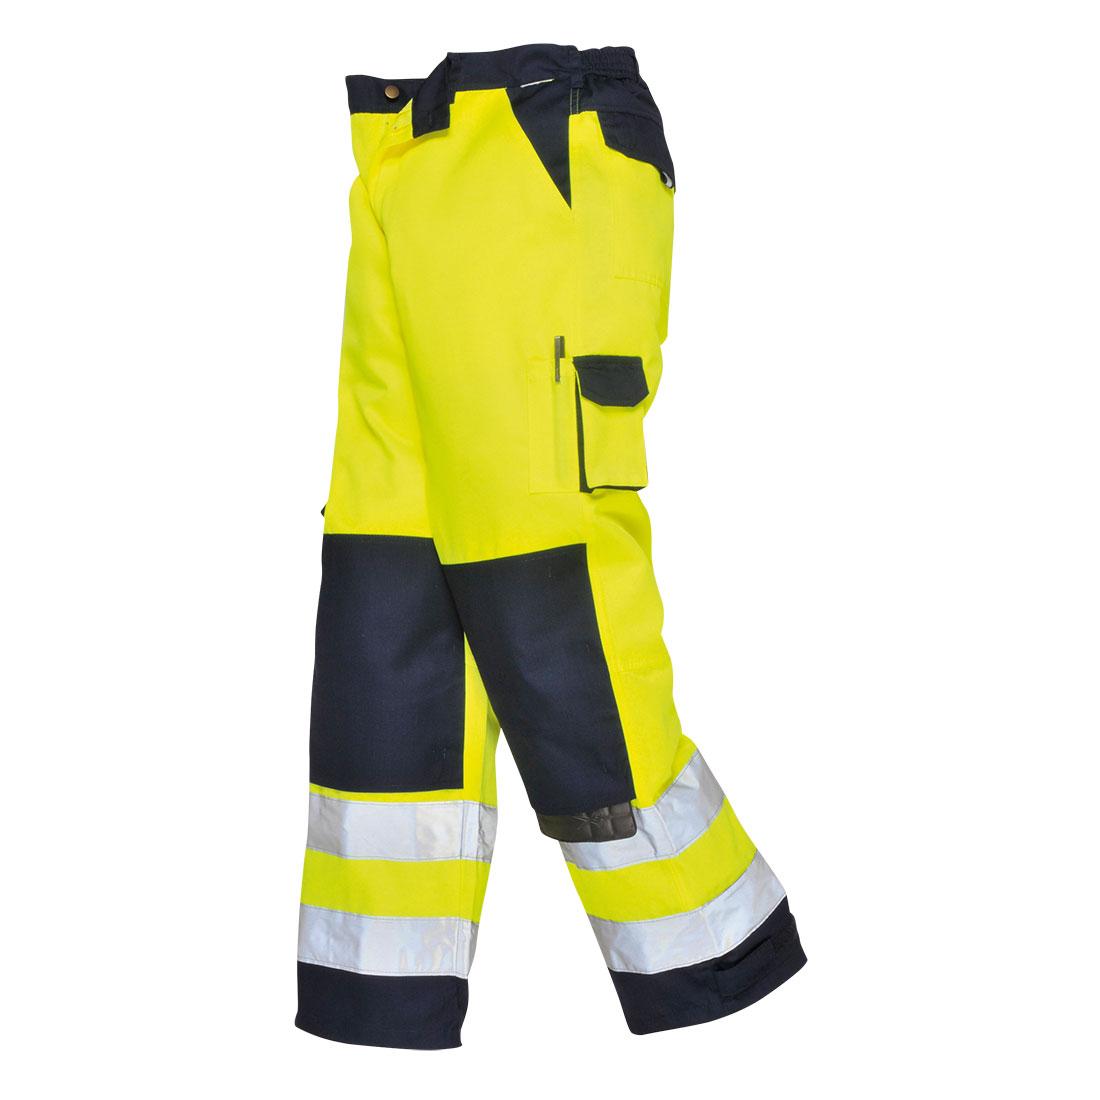 Portwest Texo Lyon Hi-Vis Trousers (Geel/Navy) XS